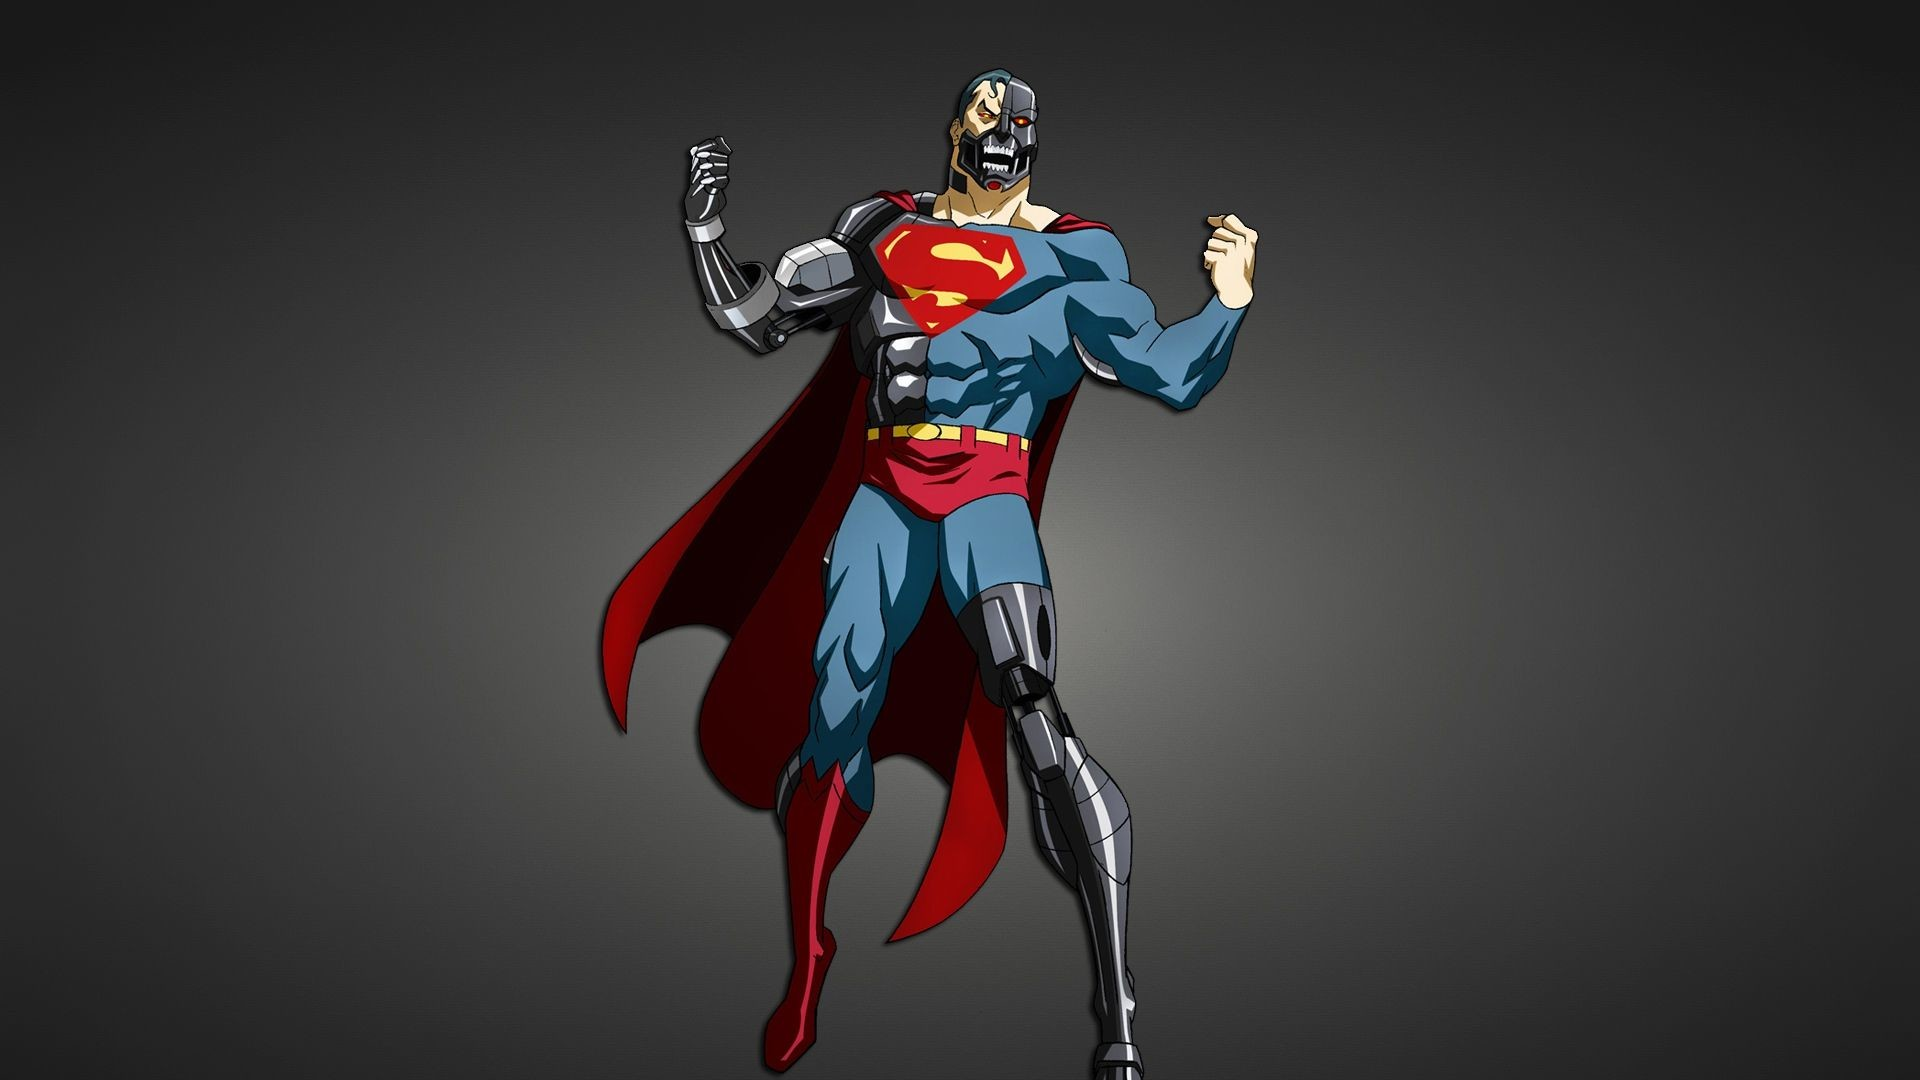 1920x1080 Hd Pics Photos Superman Comic Cartoon 2d Animated Quality Desktop Background Wallpaper